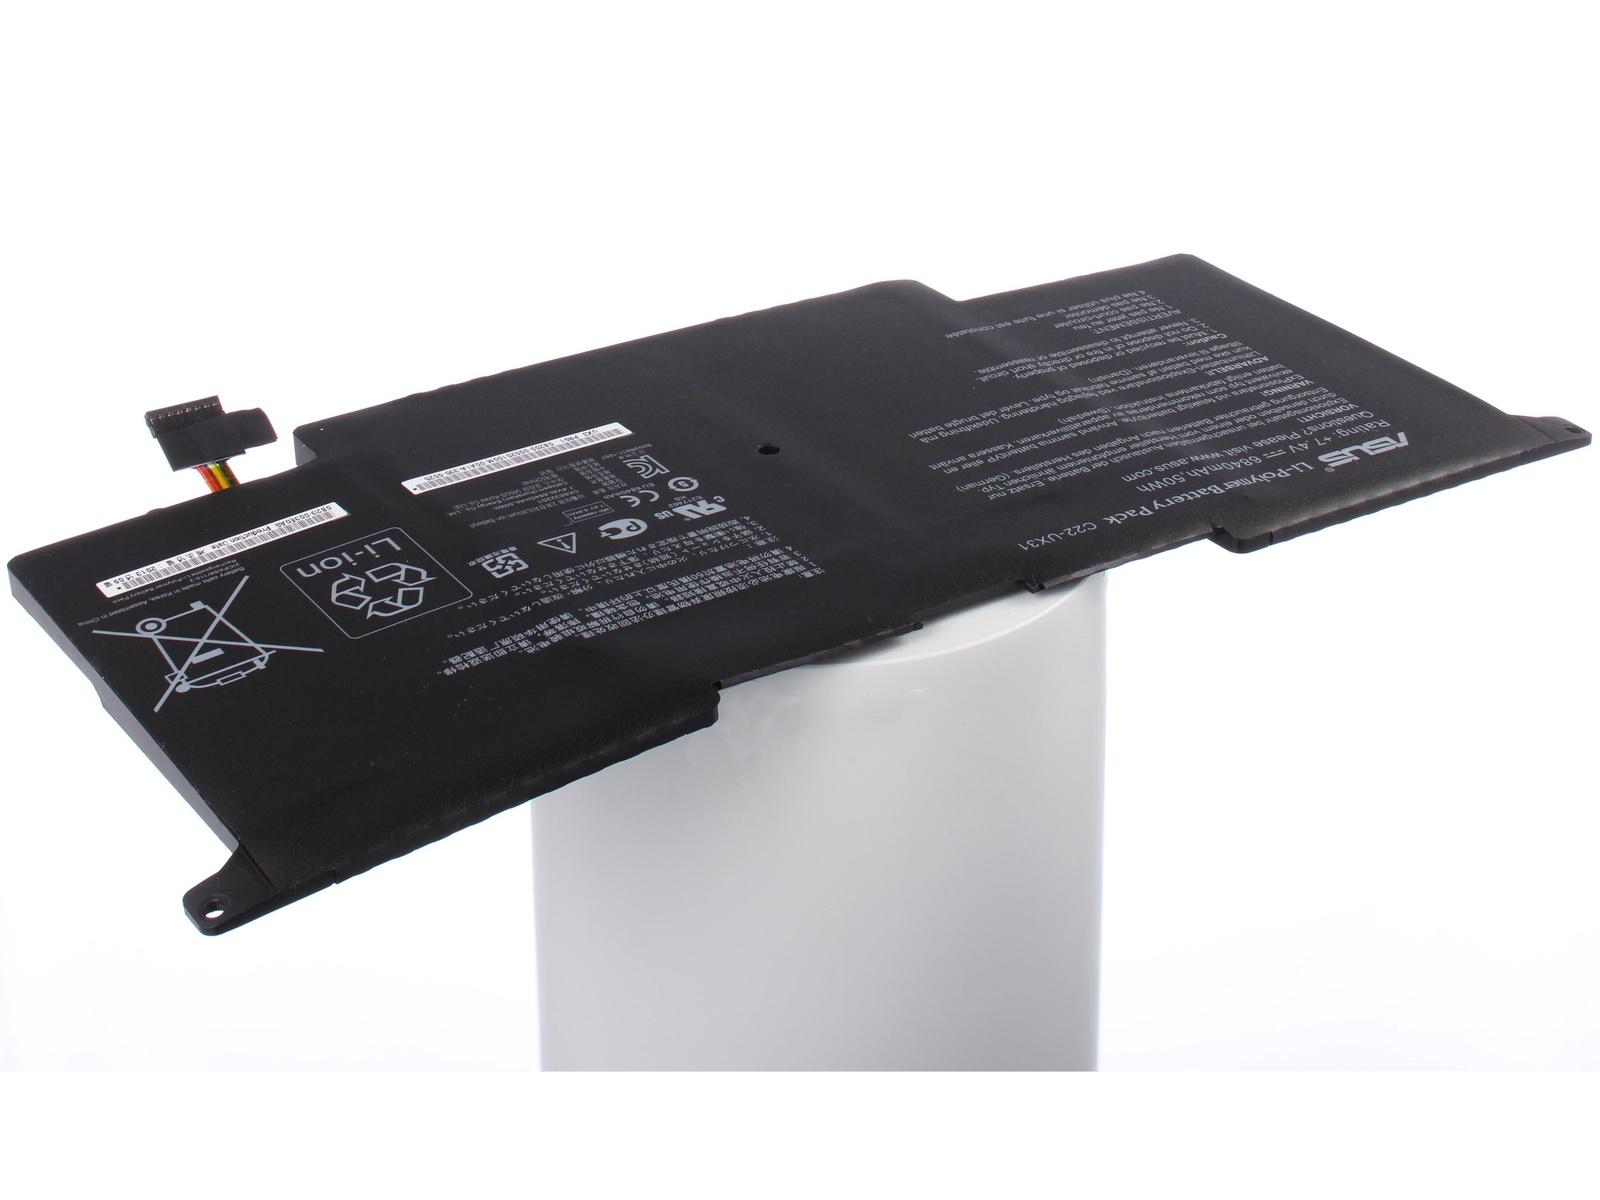 Аккумулятор для ноутбука iBatt для Asus Zenbook UX310UA, UX31A, Zenbook UX310UQ, UX31E, UX31A Zenbook, ZENBOOK UX31E, UX31E Zenbook, Zenbook Prime UX31A, ZenBook UX31, ZENBOOK Touch UX31A, UX31A-R4003X, ZenBook UX31E-DH52 genuine original new laptop battery for asus zenbook ux42 ux42e3537vs sl ux42e3517vs sl c22 ux42 7 4v 6140mah 45wh free shipping